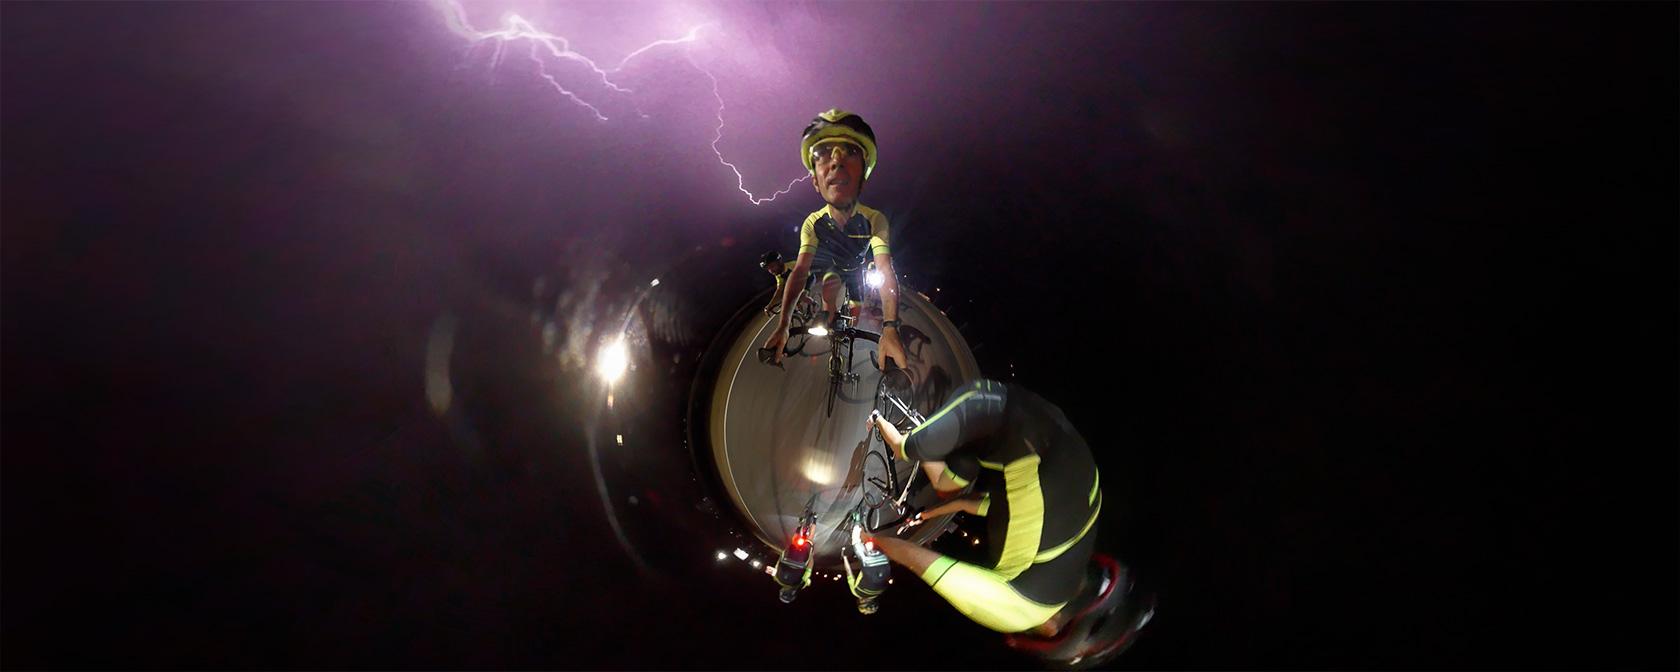 portada-vr-thunder-road